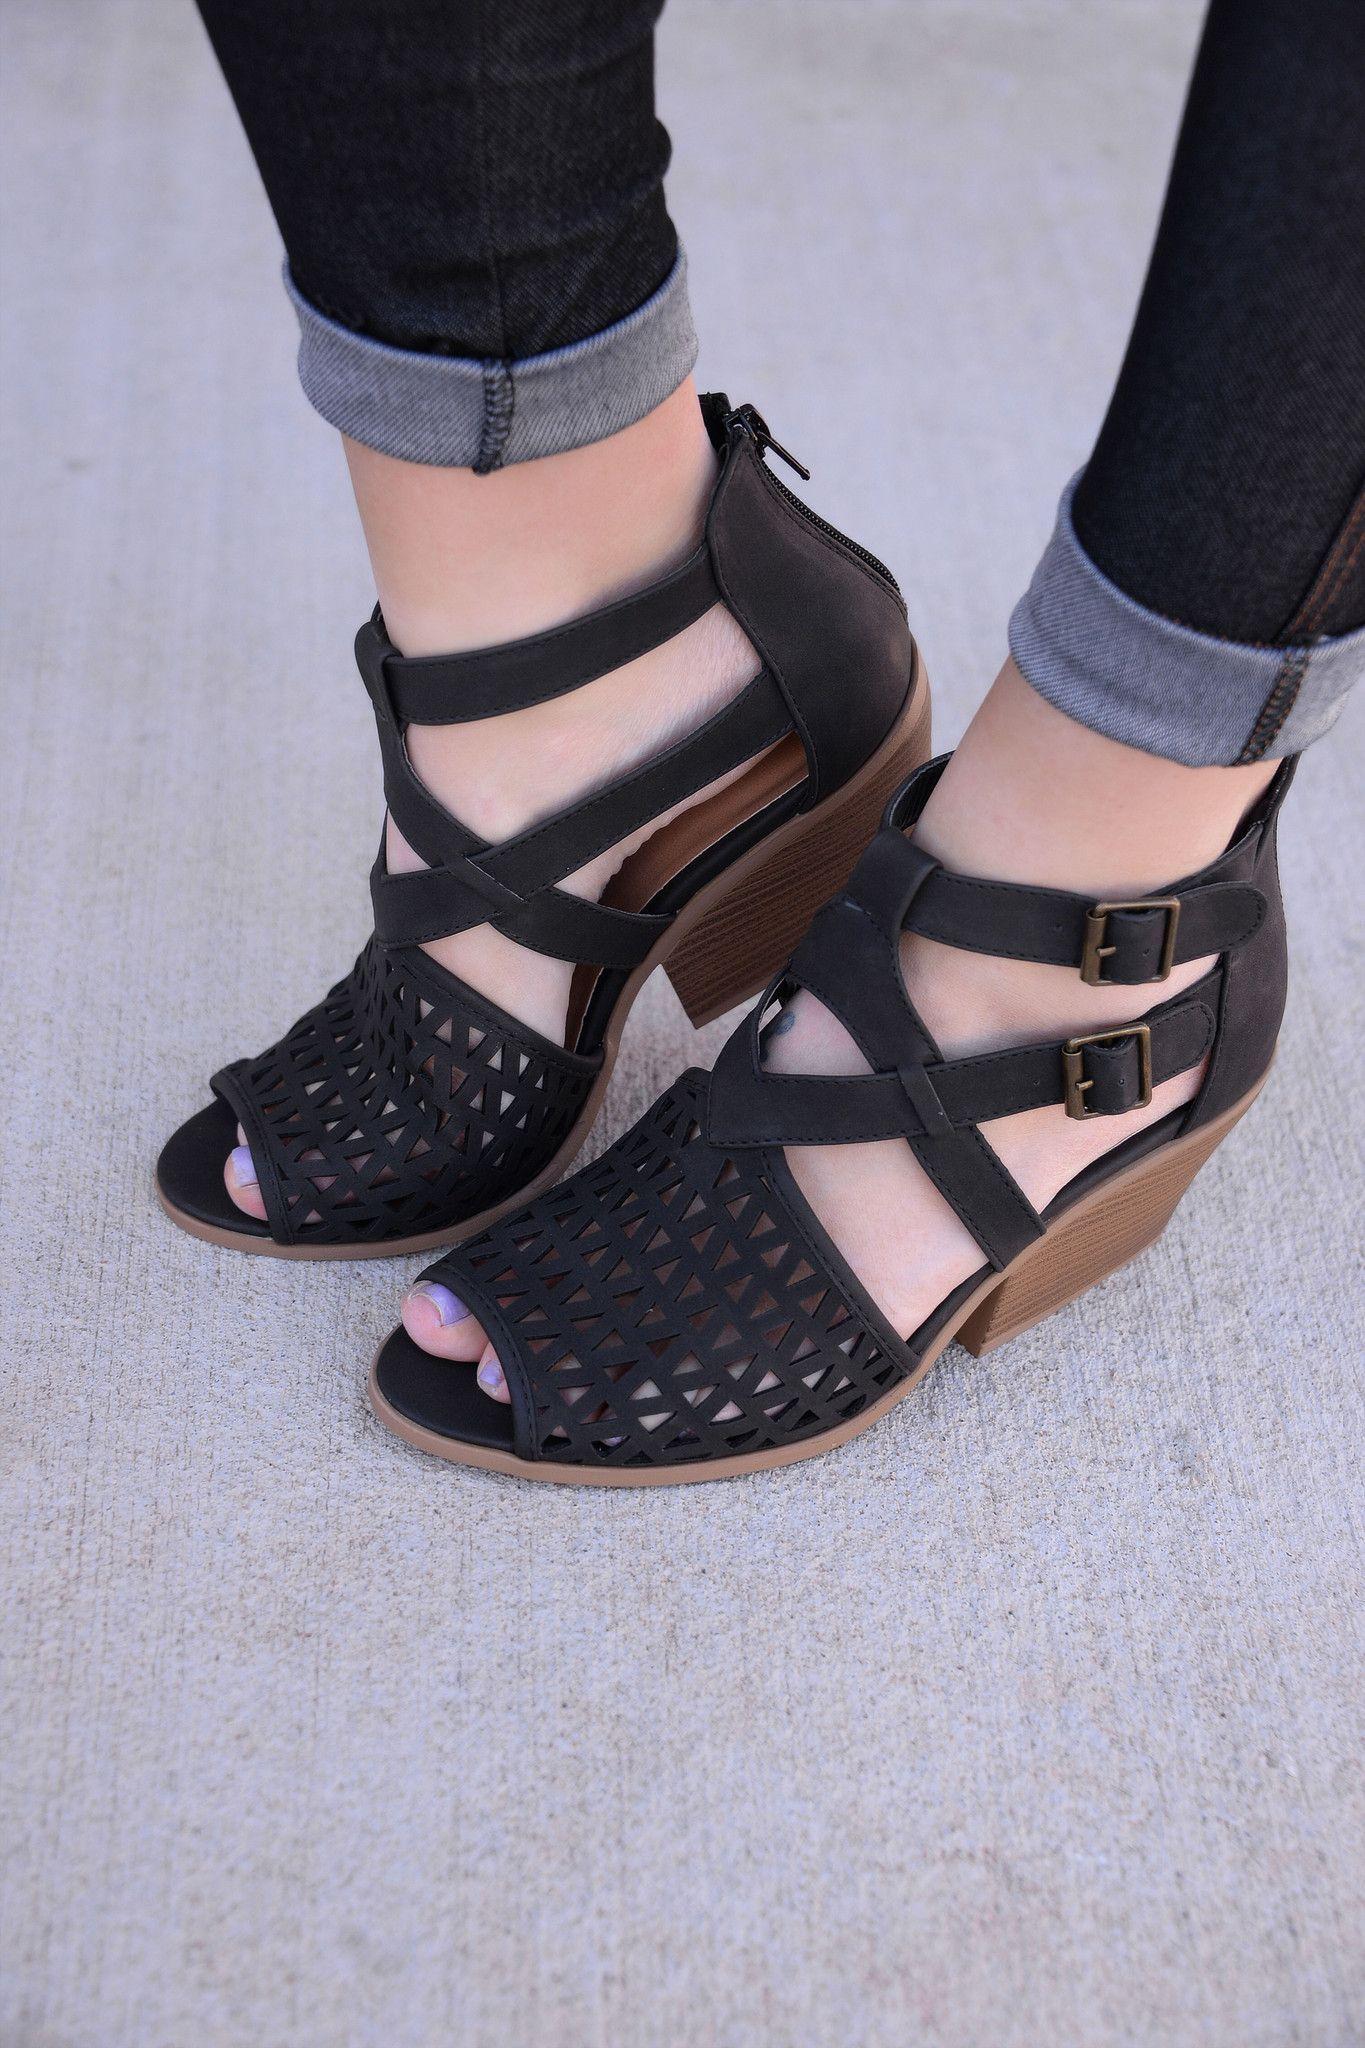 Watch Her Strut Black Shoes Sho550bk Black Shoes Shoes Shoe Gallery